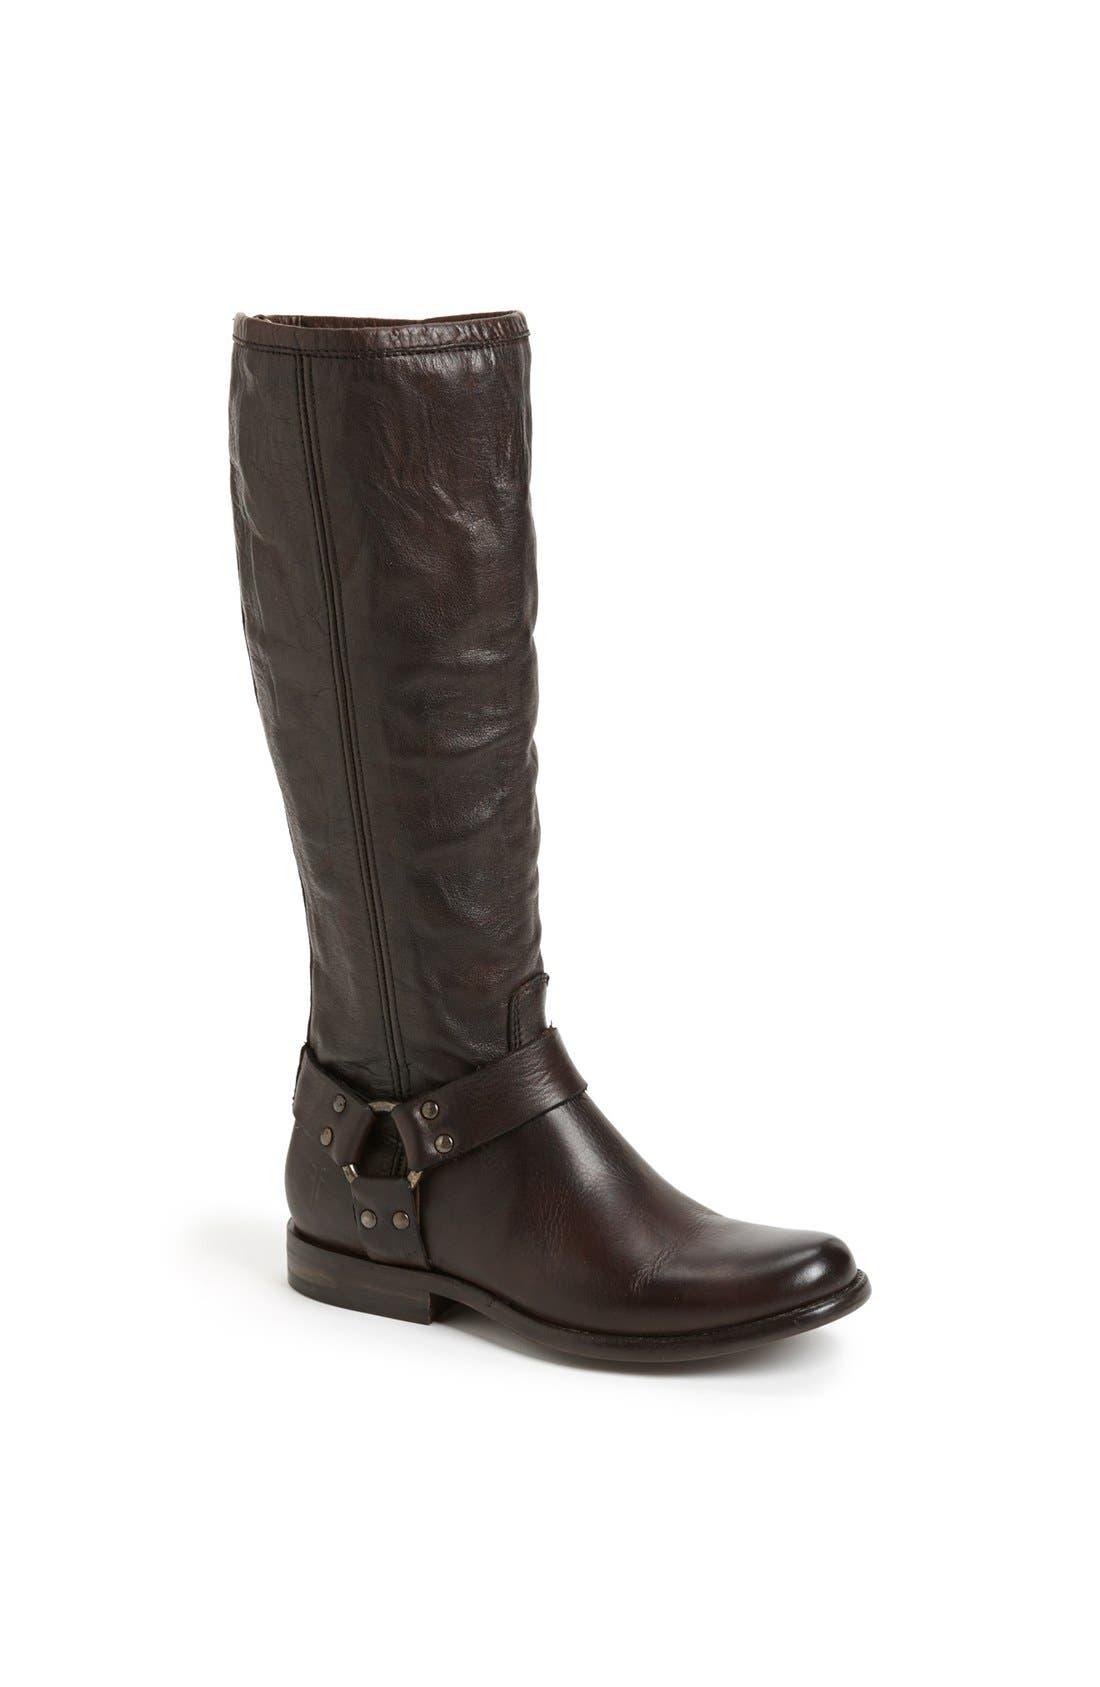 Main Image - Frye 'Phillip Harness' Tall Boot